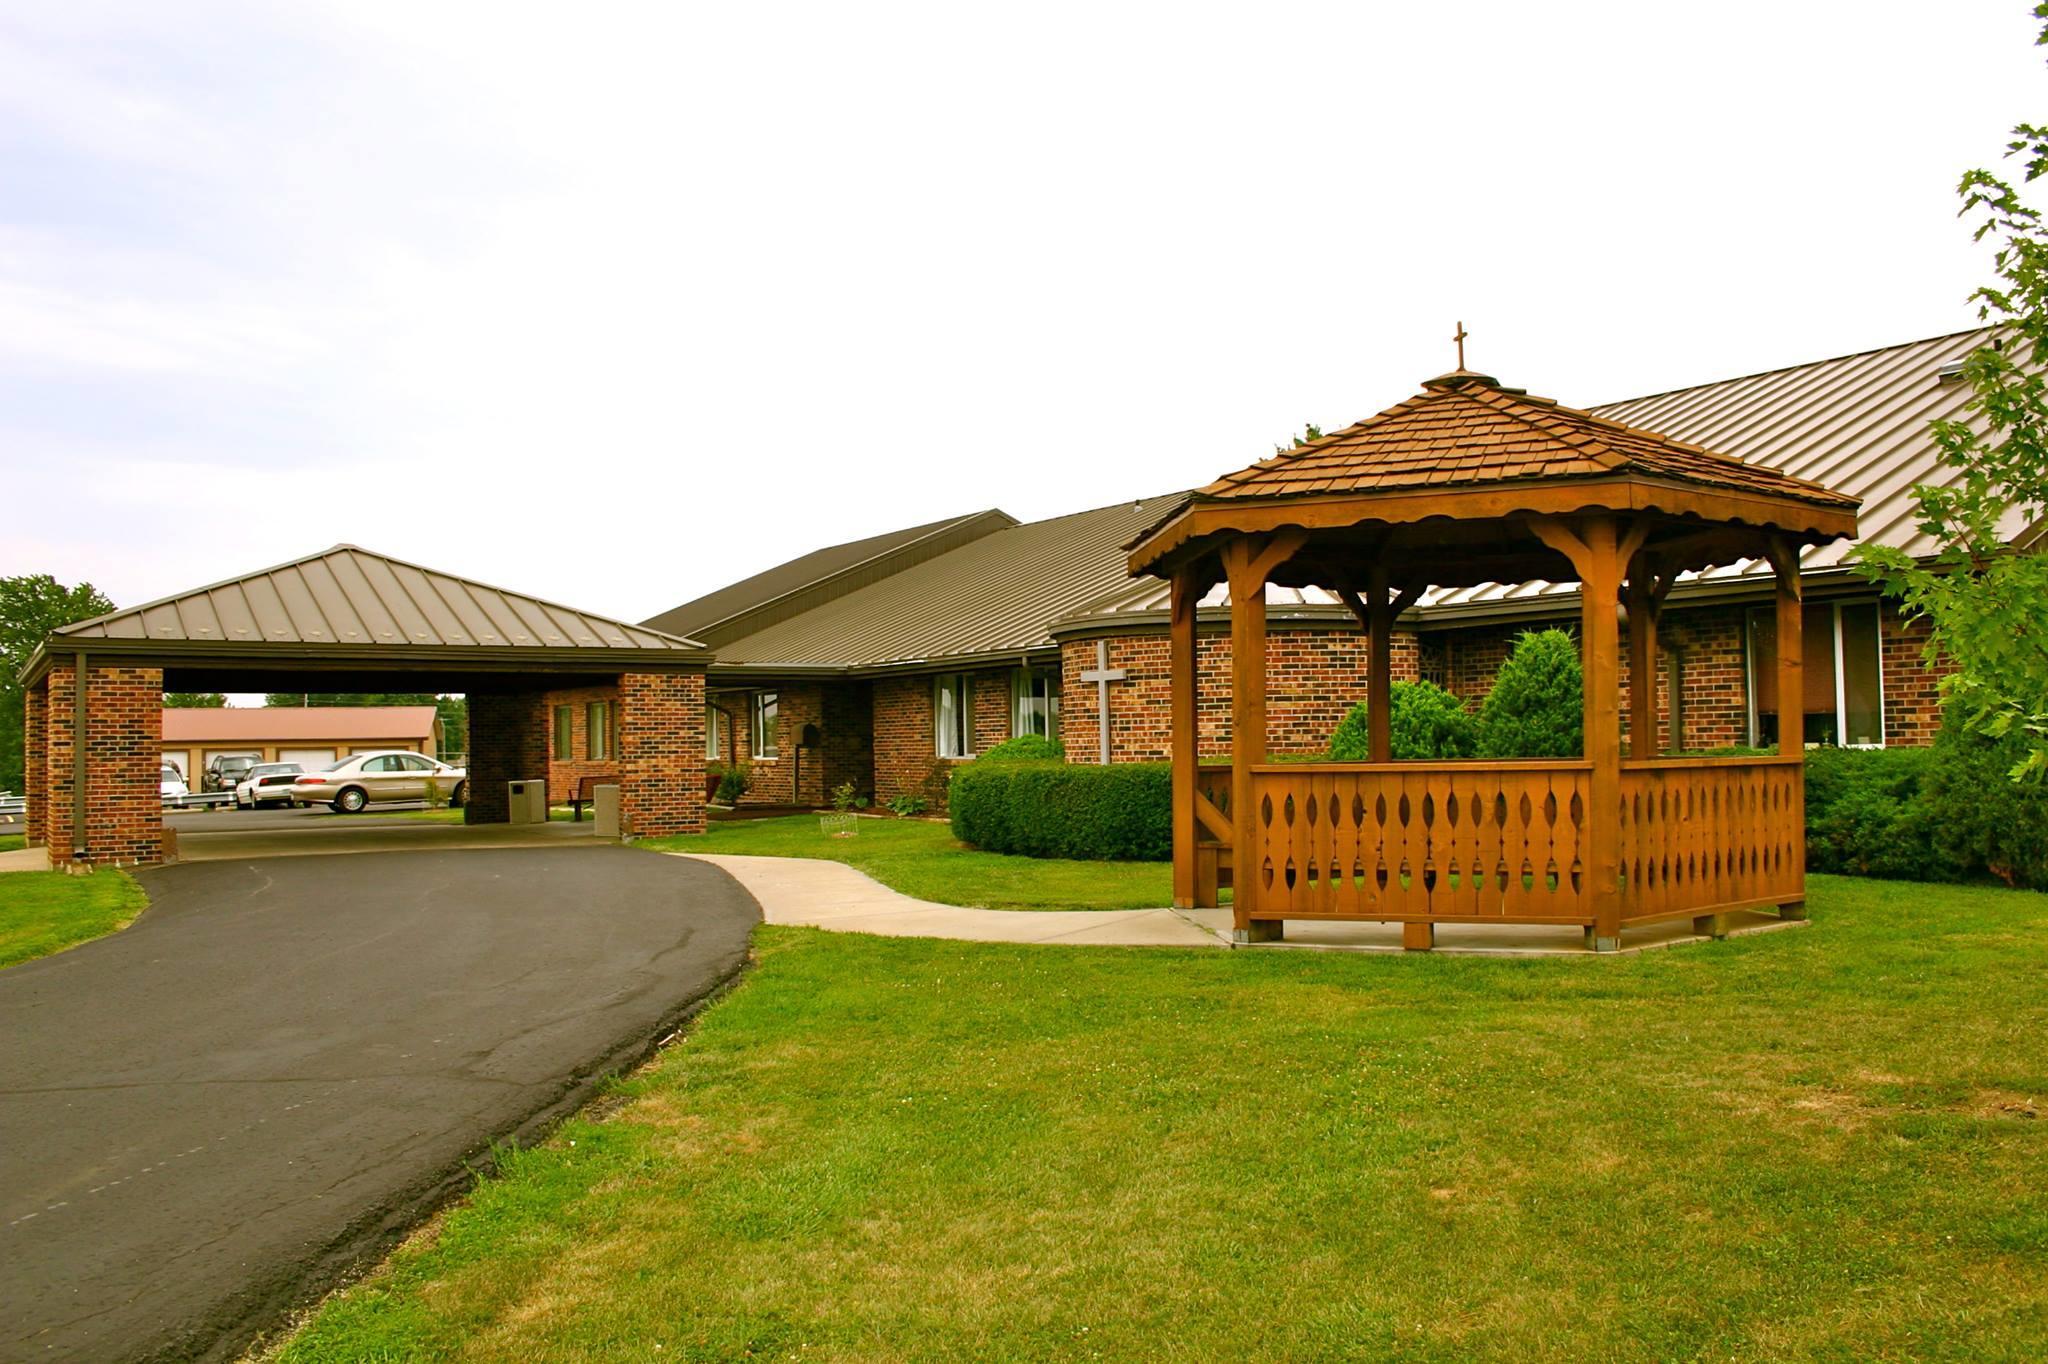 La Verna Village Nursing Home & Rehab - Savannah, MO 64485 - (816)324-3185 | ShowMeLocal.com